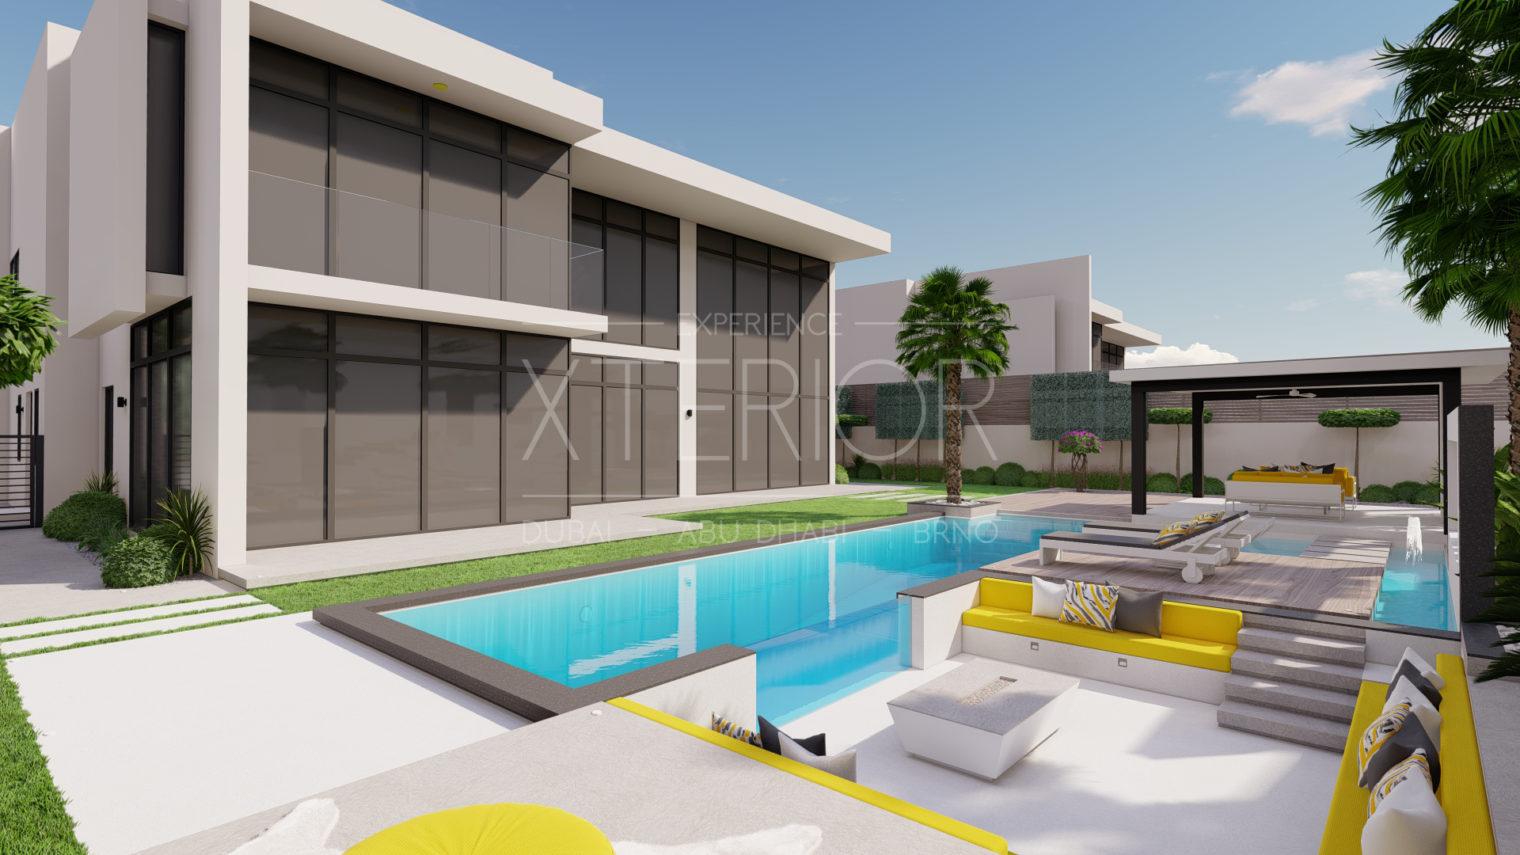 Swimming pool construction company Abu dhabi